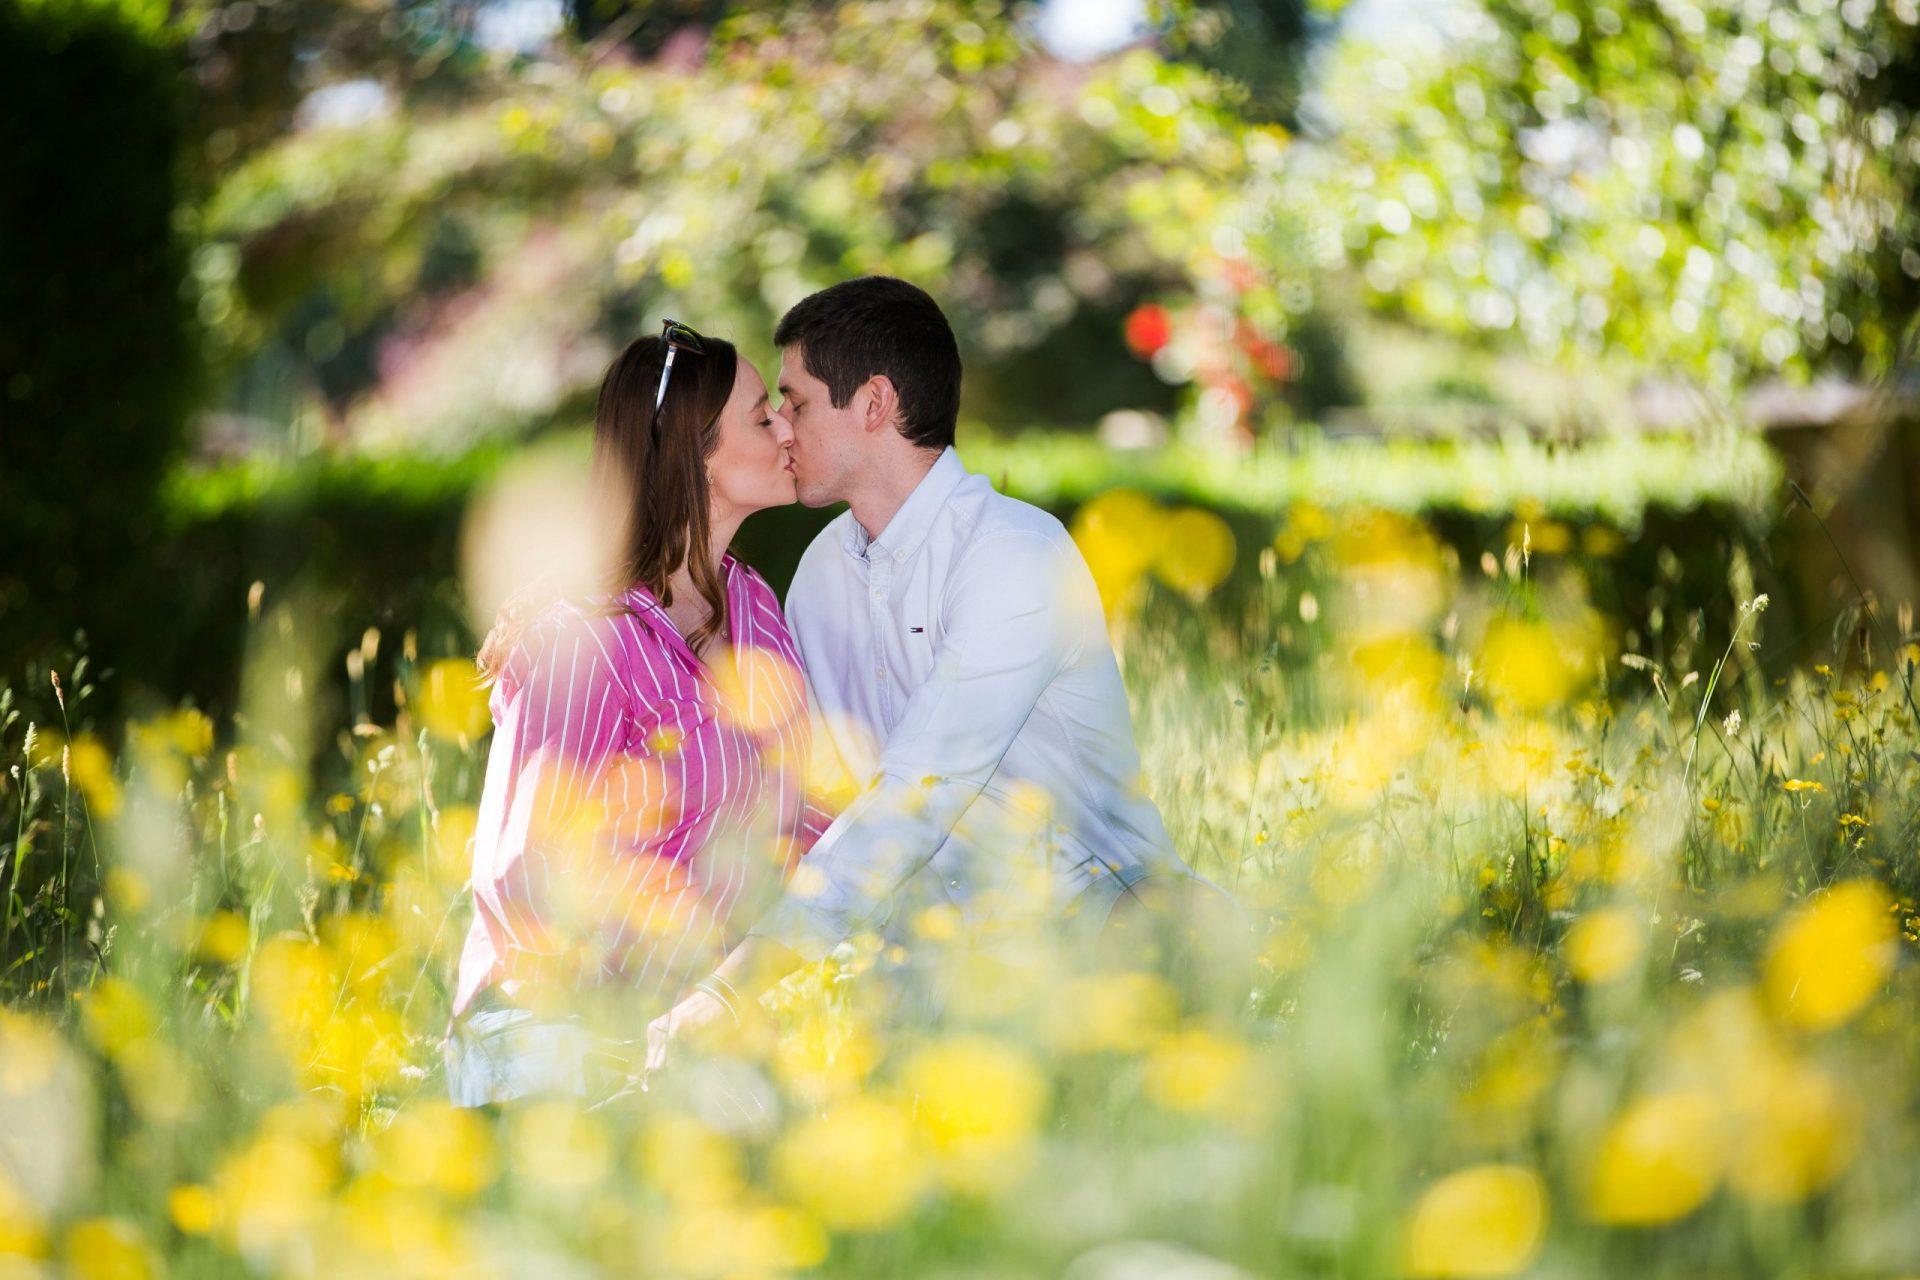 Leeds Wedding Photographer in Leeds and Yorkshire